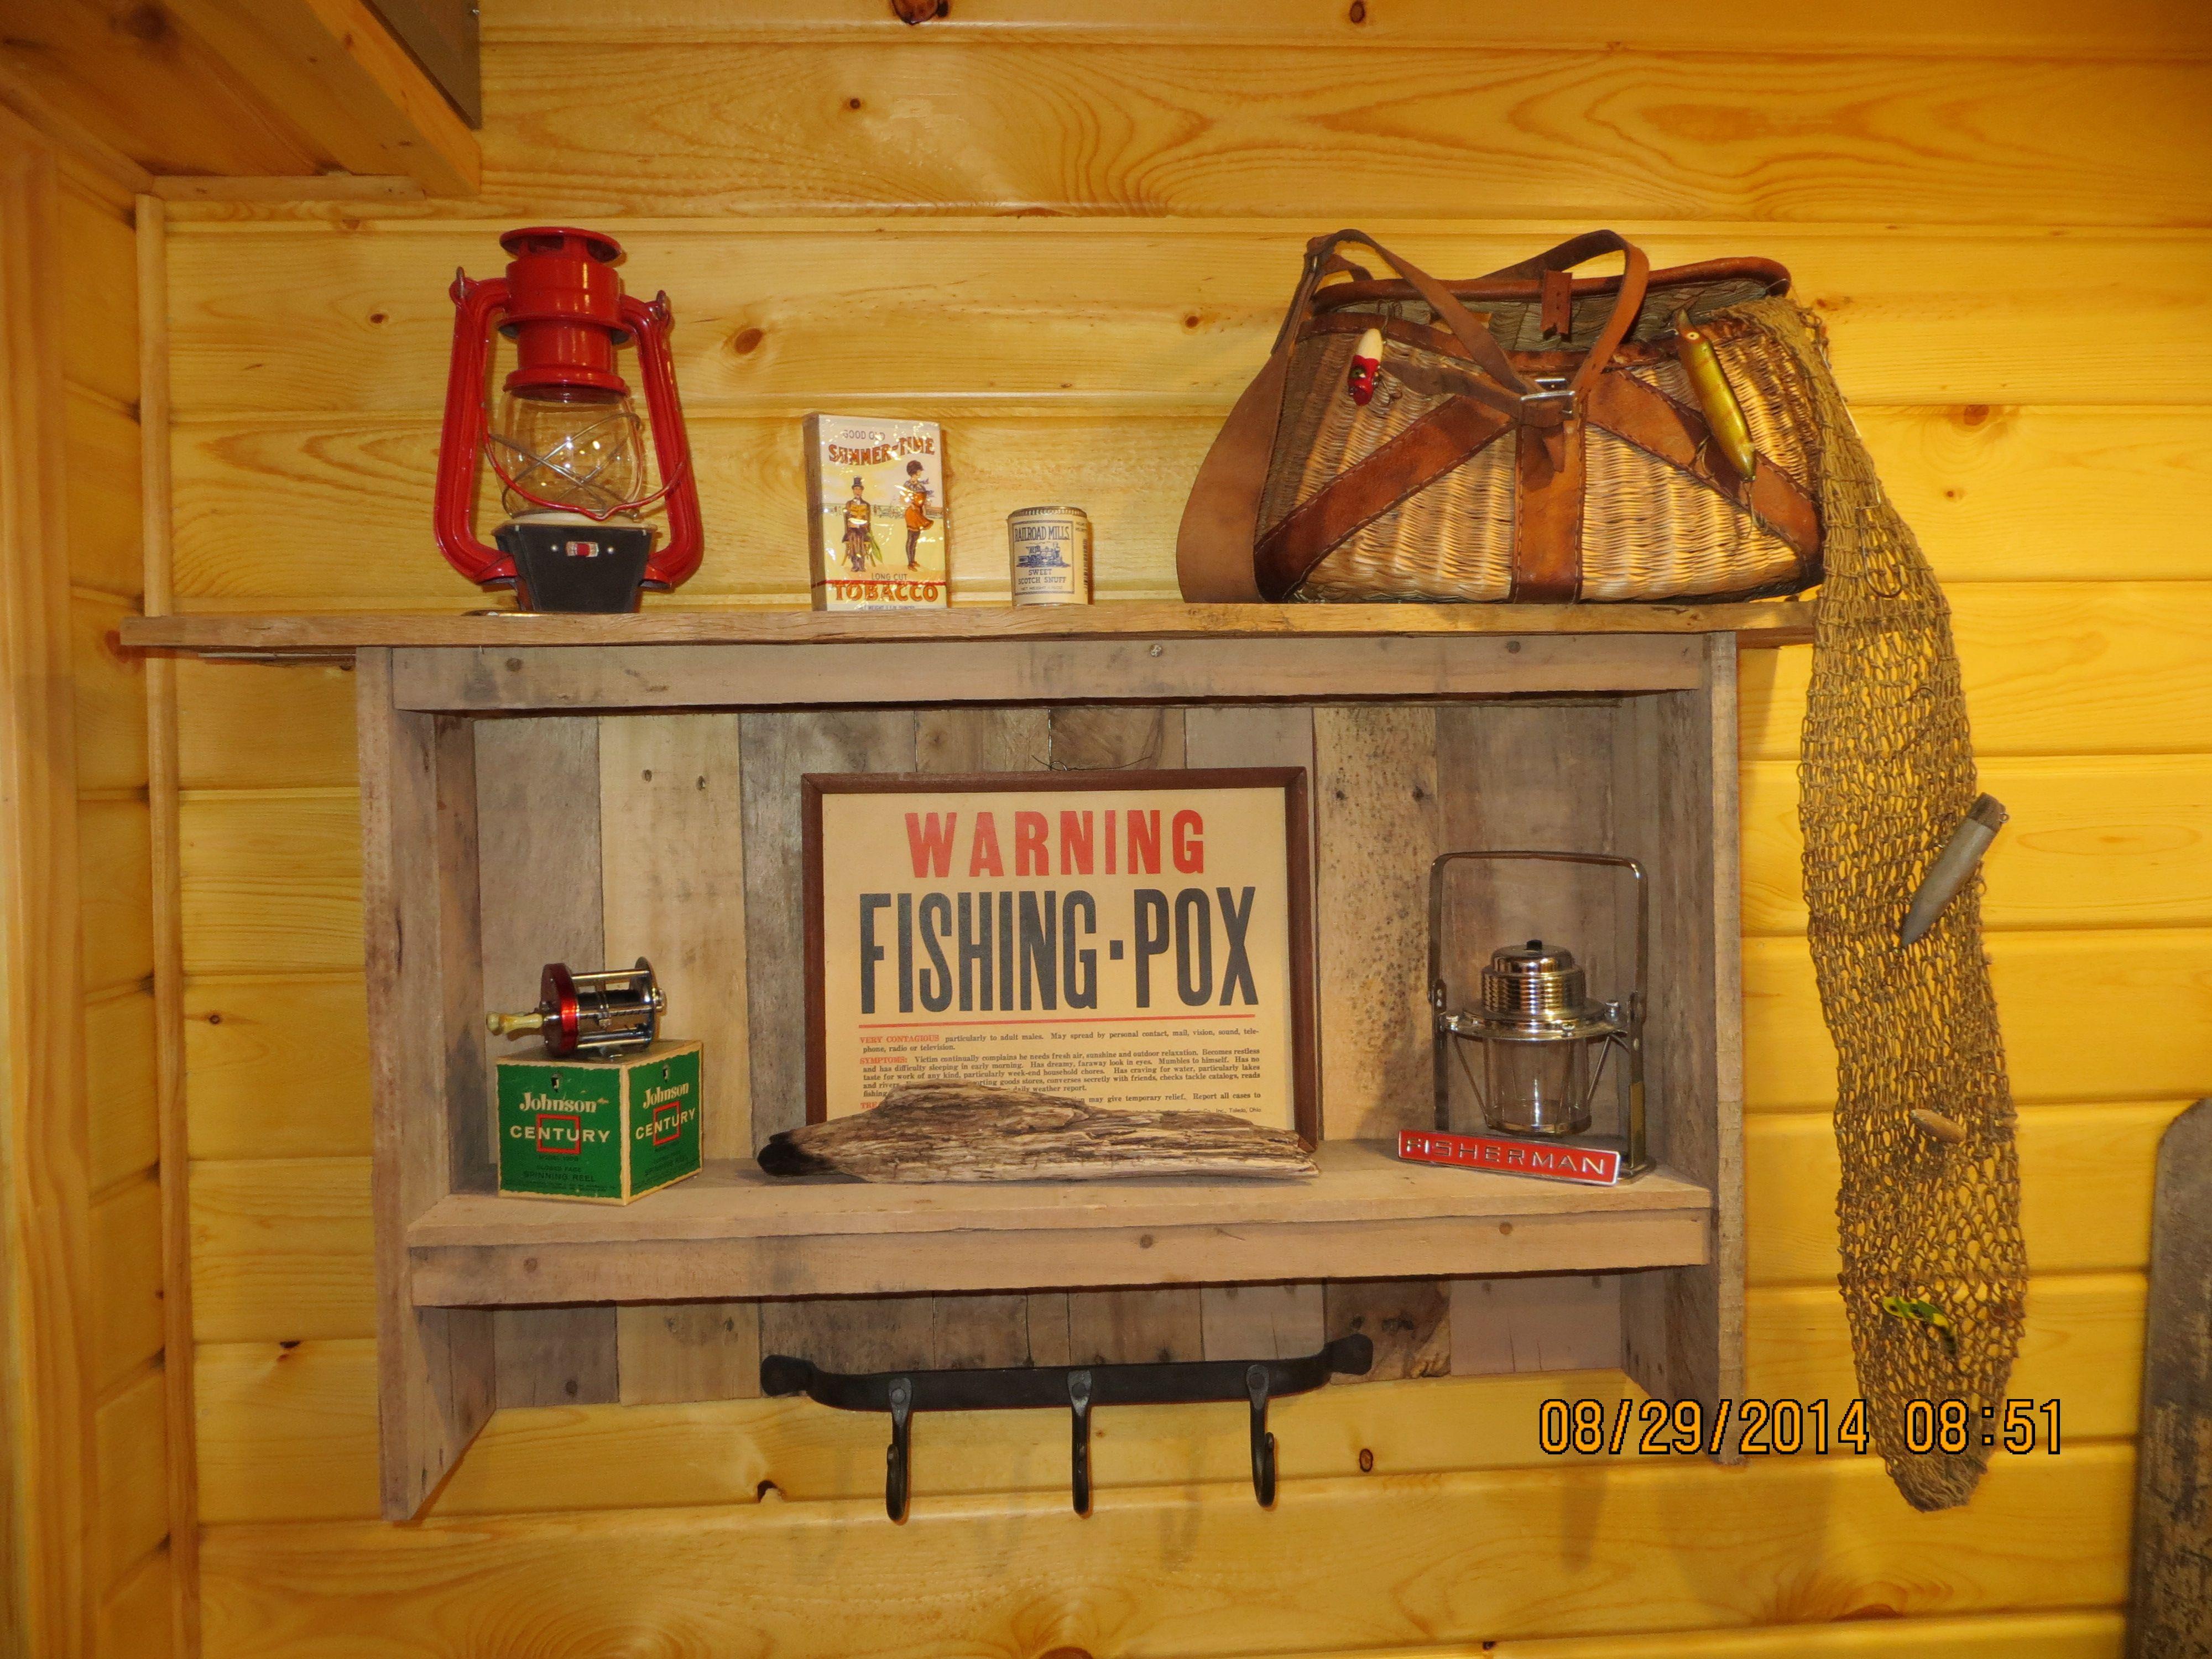 Shelf made from repurposed pallet wood - David Gabel Fond du lac, WI